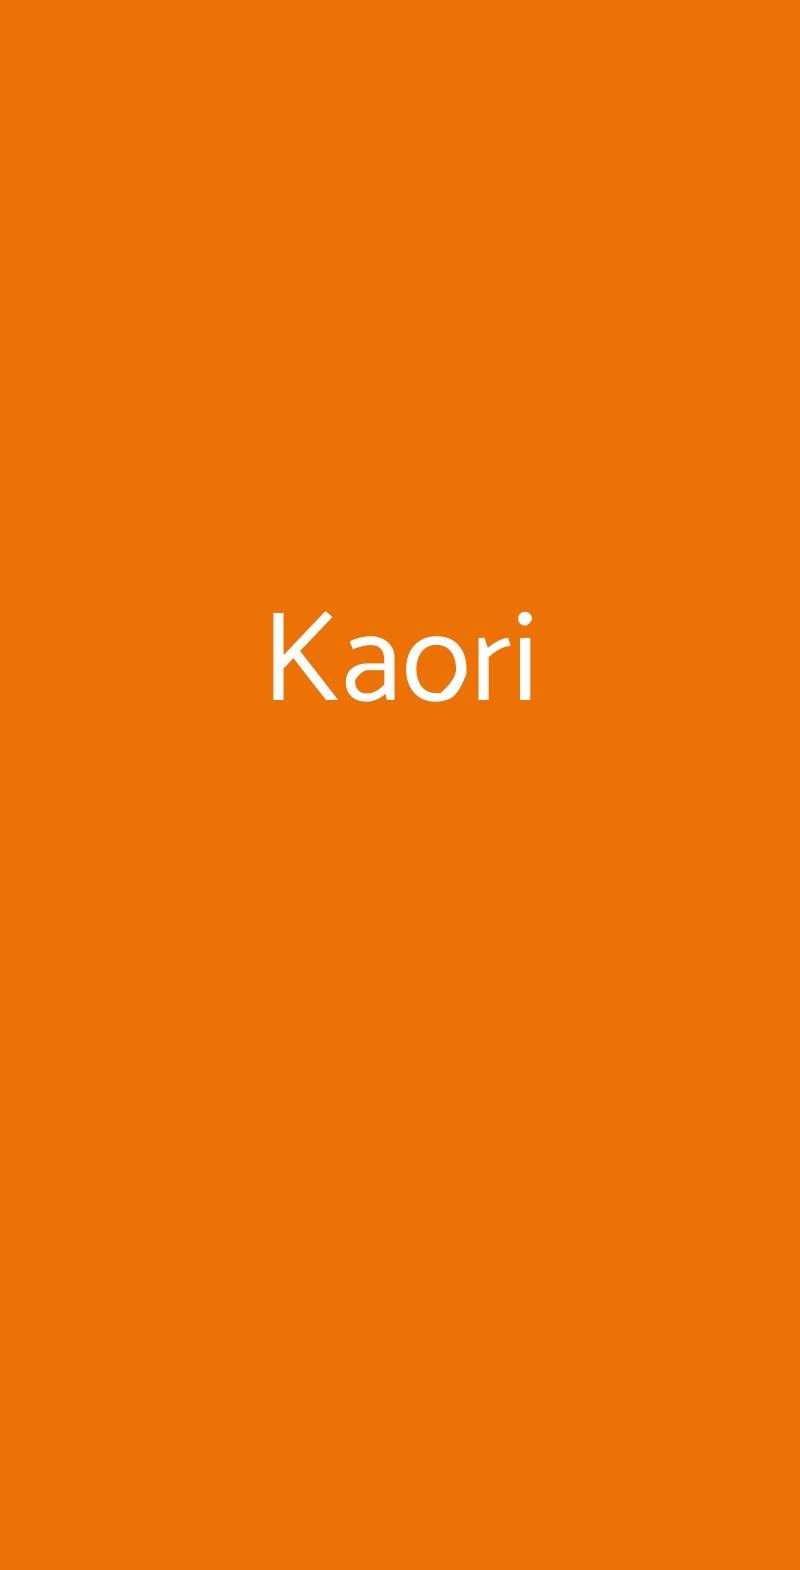 Kaori Milano menù 1 pagina